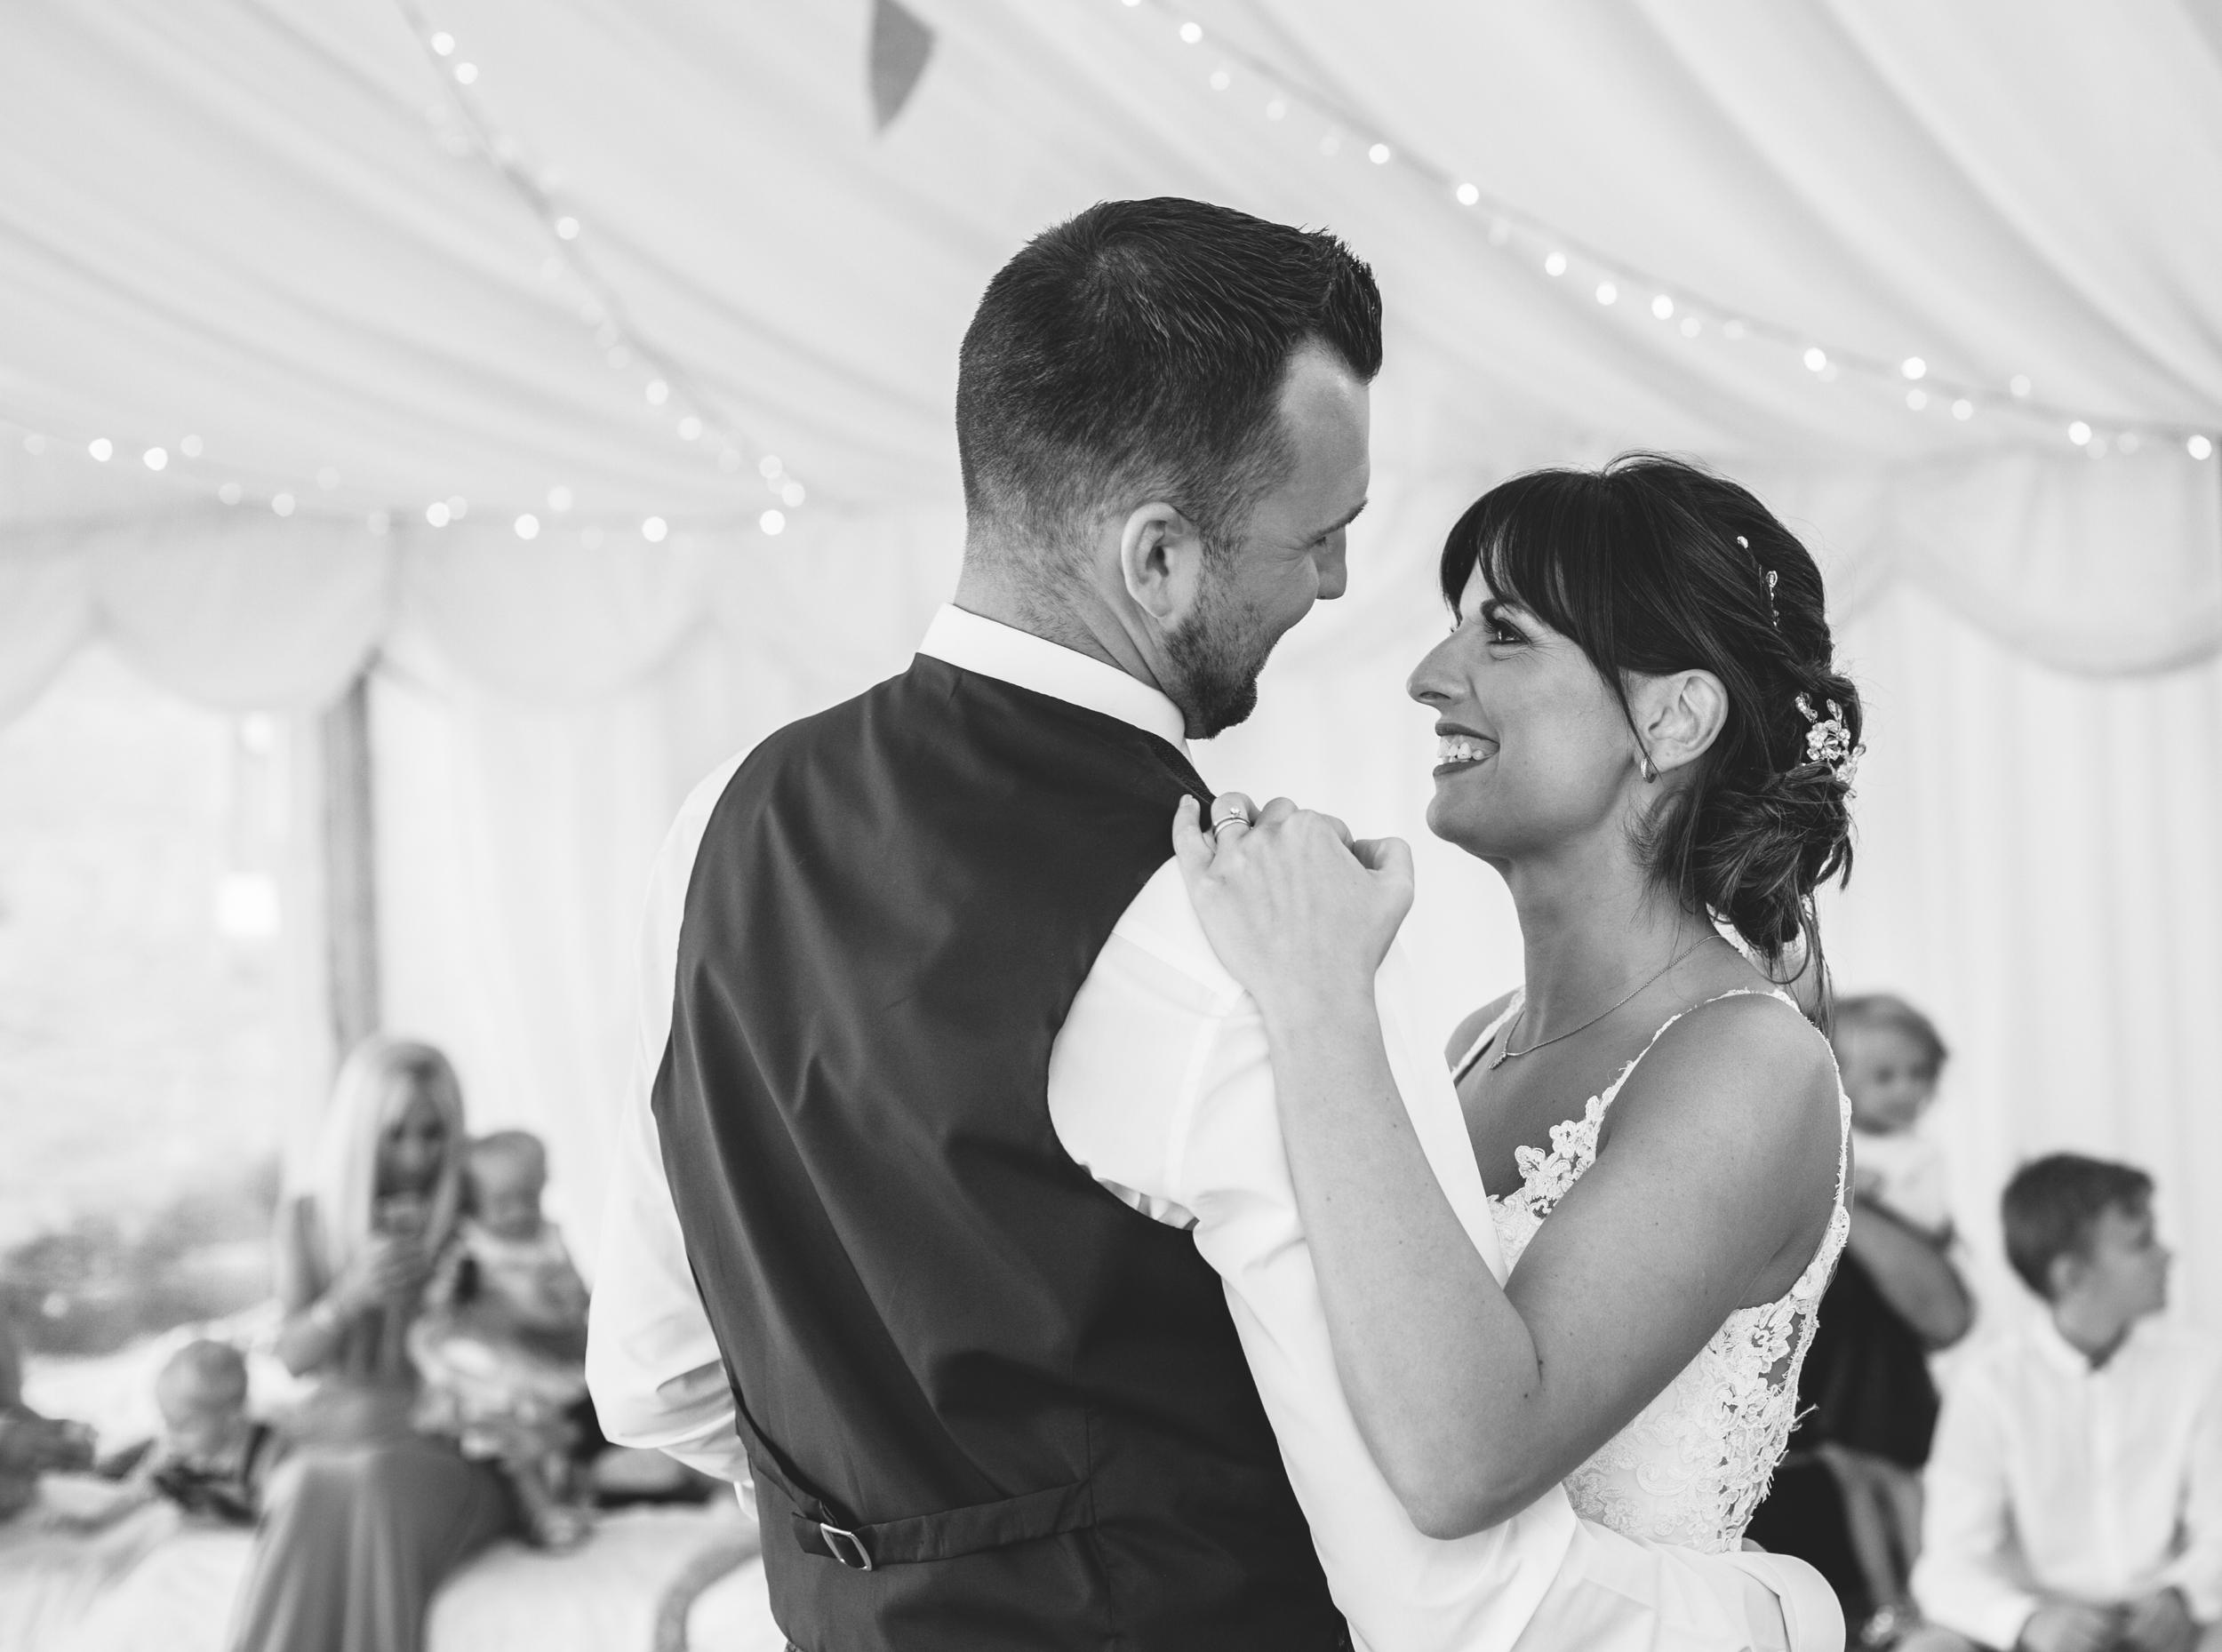 wedding photographers in aberdeen, wedding photography Aberdeenshire, Aberdeenshire wedding photographer, alternative wedding photography Scotland, Scottish wedding photographer